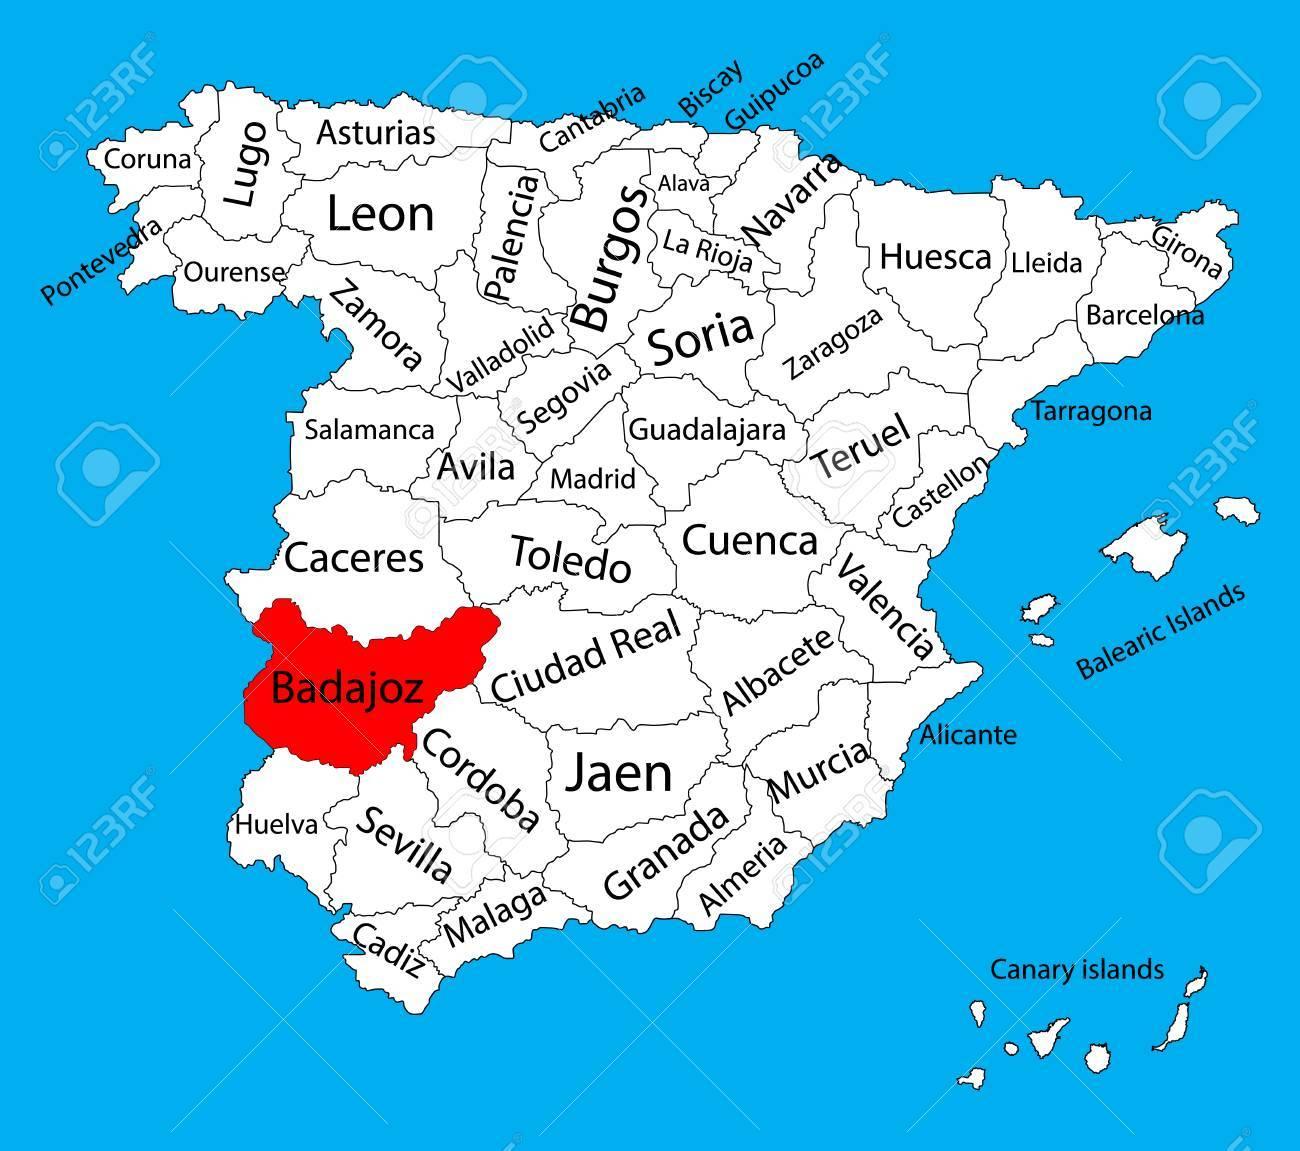 mapa badajoz espanha Badajoz, Badajos Map, Spain Province Vector Map. High Detailed  mapa badajoz espanha